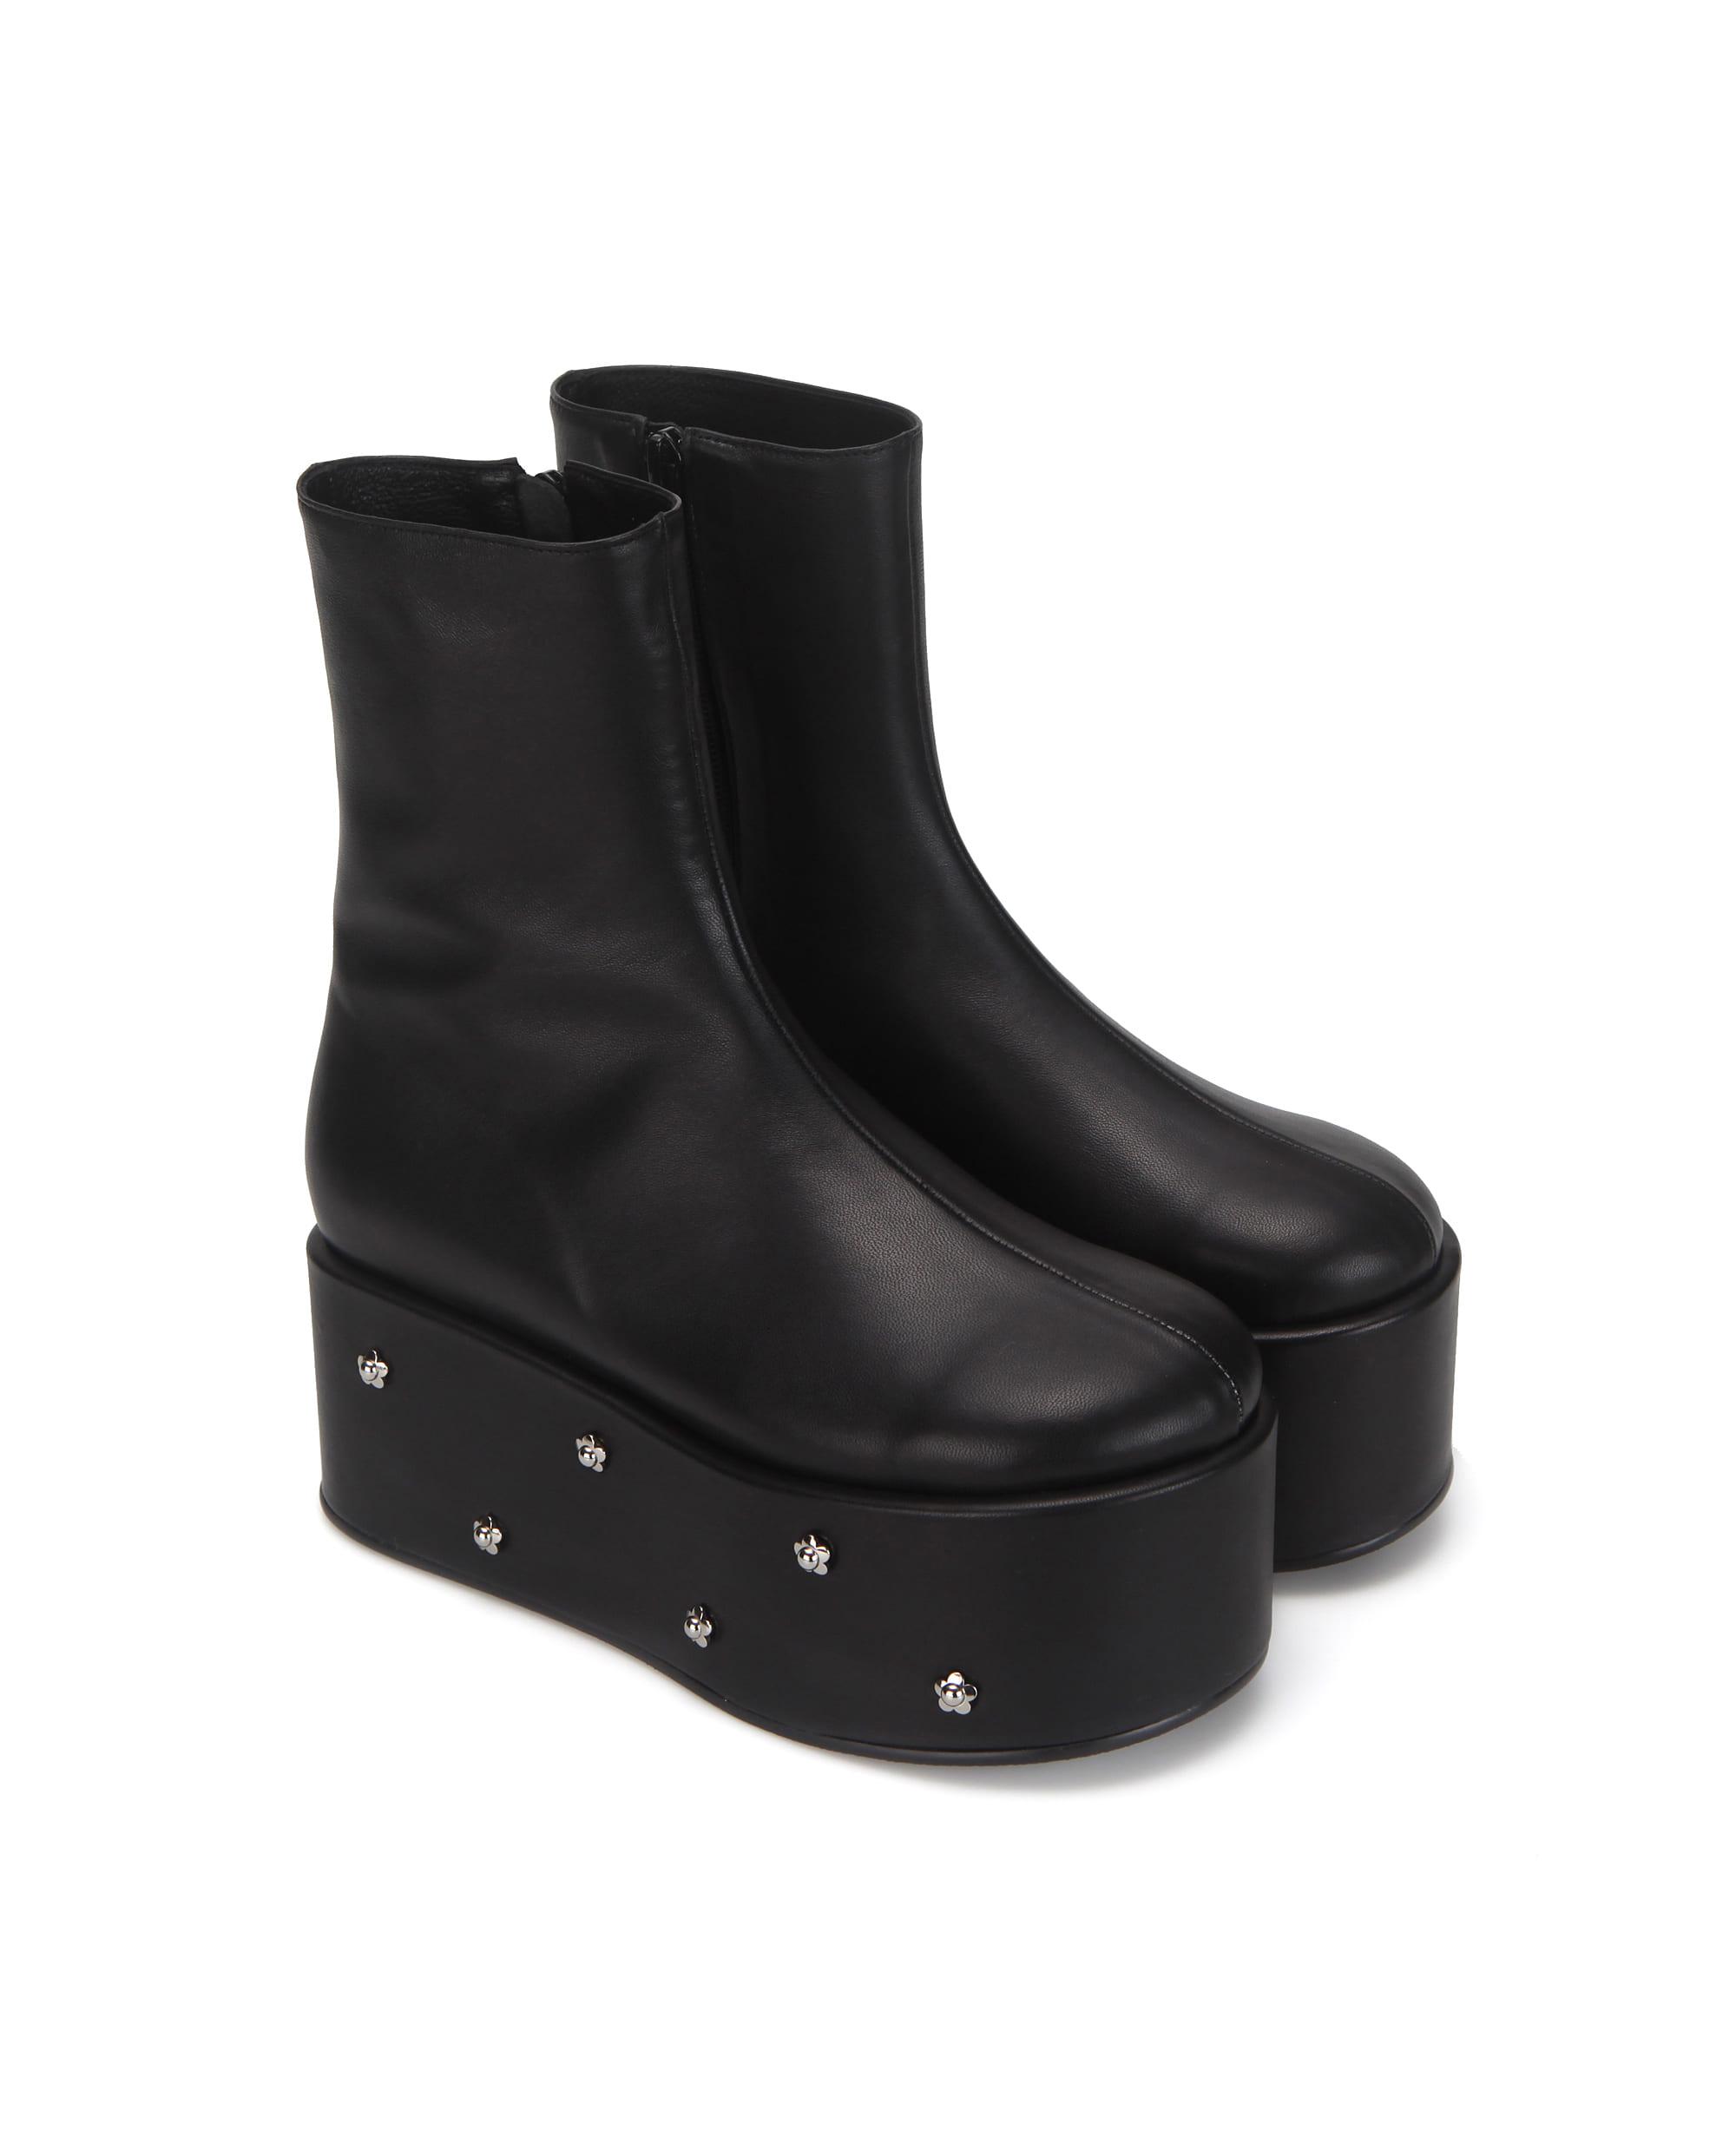 Pebble toe flower platform boots | Black